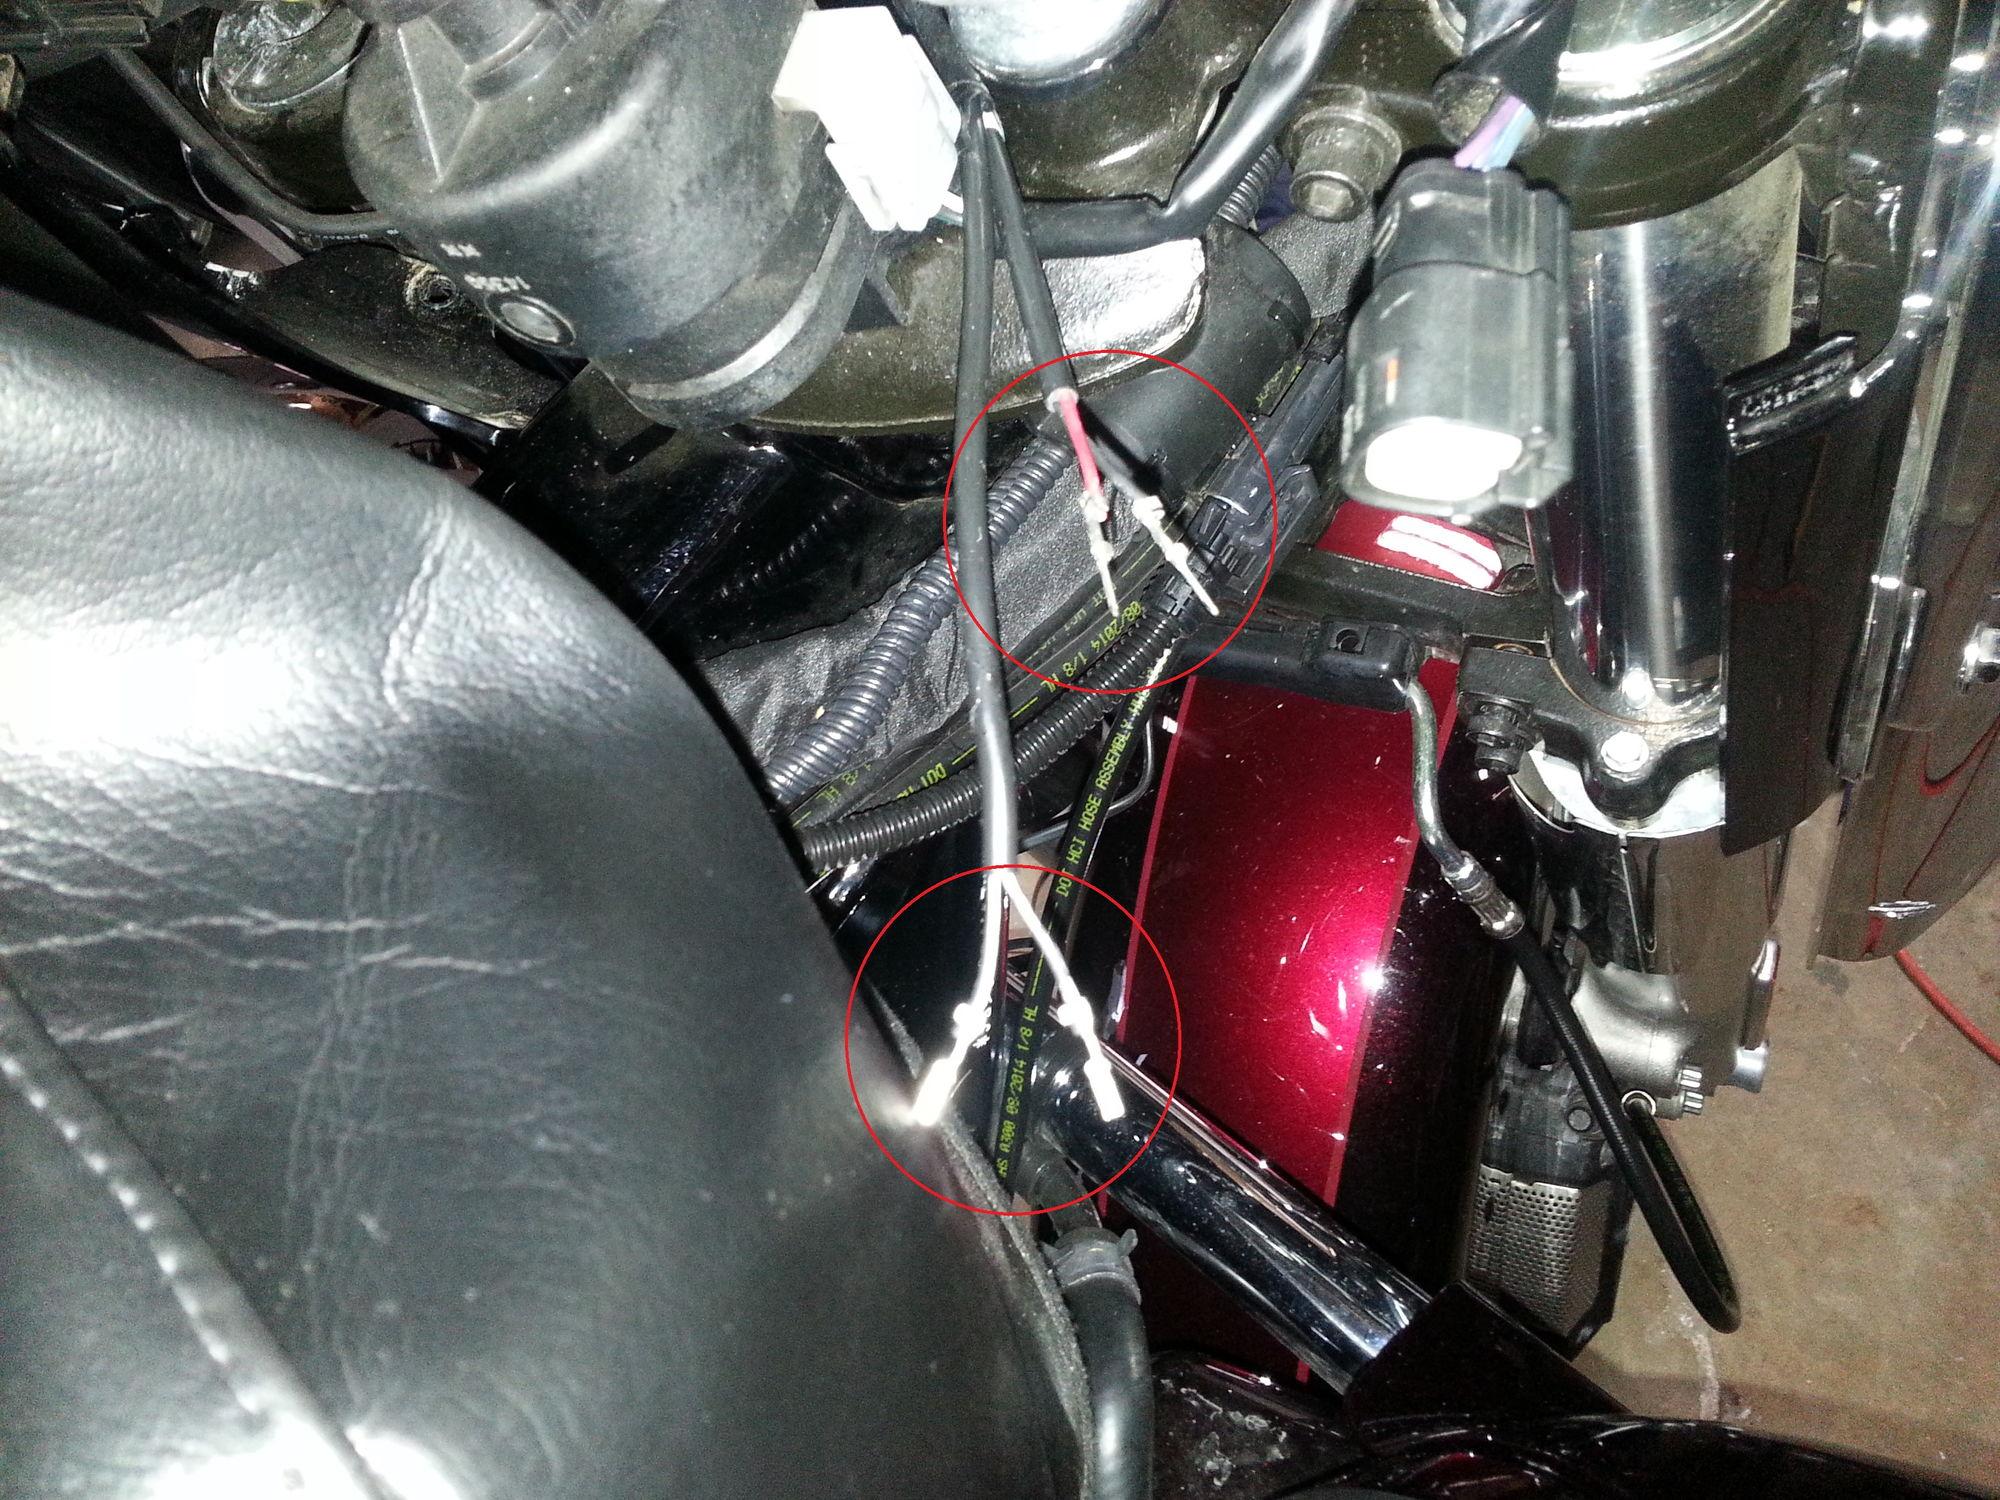 Harley Davidson Heated Grips Wiring Diagram on simple harley wiring diagram, harley ace, harley-davidson wiring harness diagram,